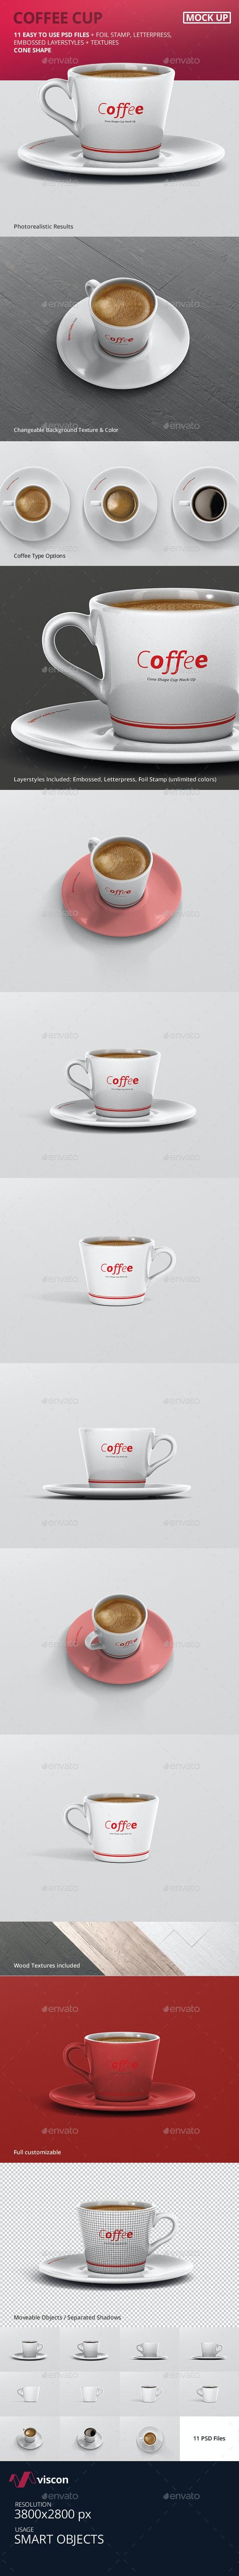 Coffee Cup Mockup - Cone Shape - Logo Product Mock-Ups